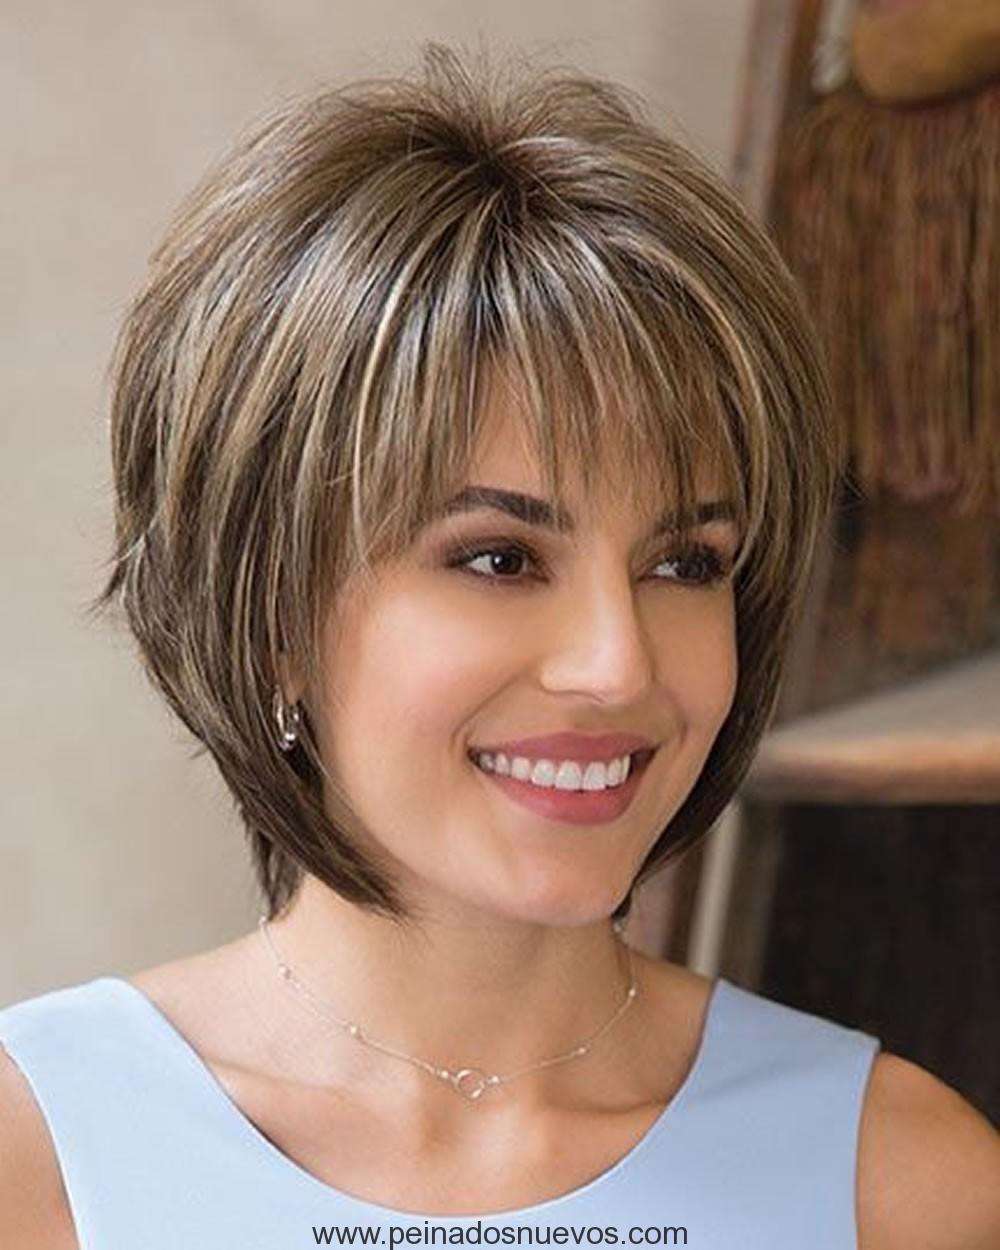 23 Cortes de cabello en pelo corto 2019